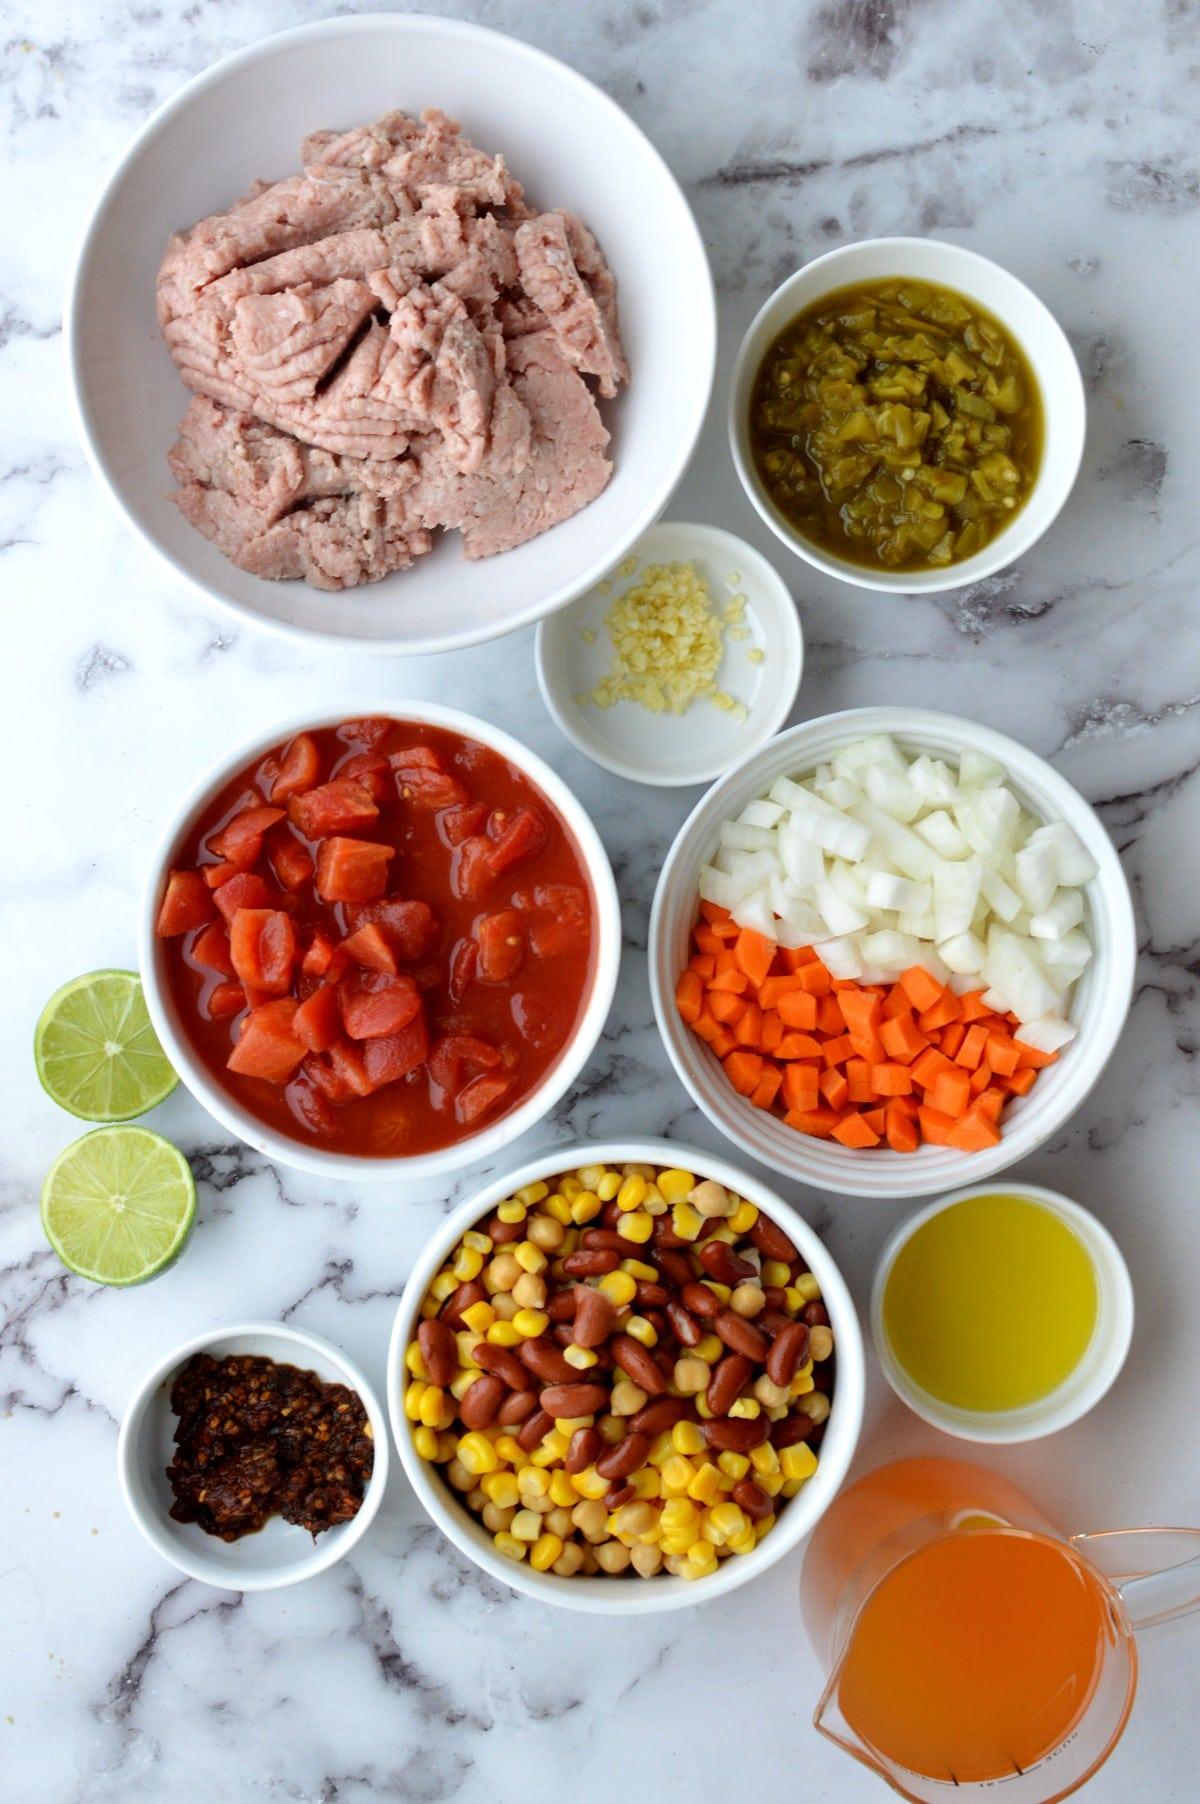 Ingredients for panera chili